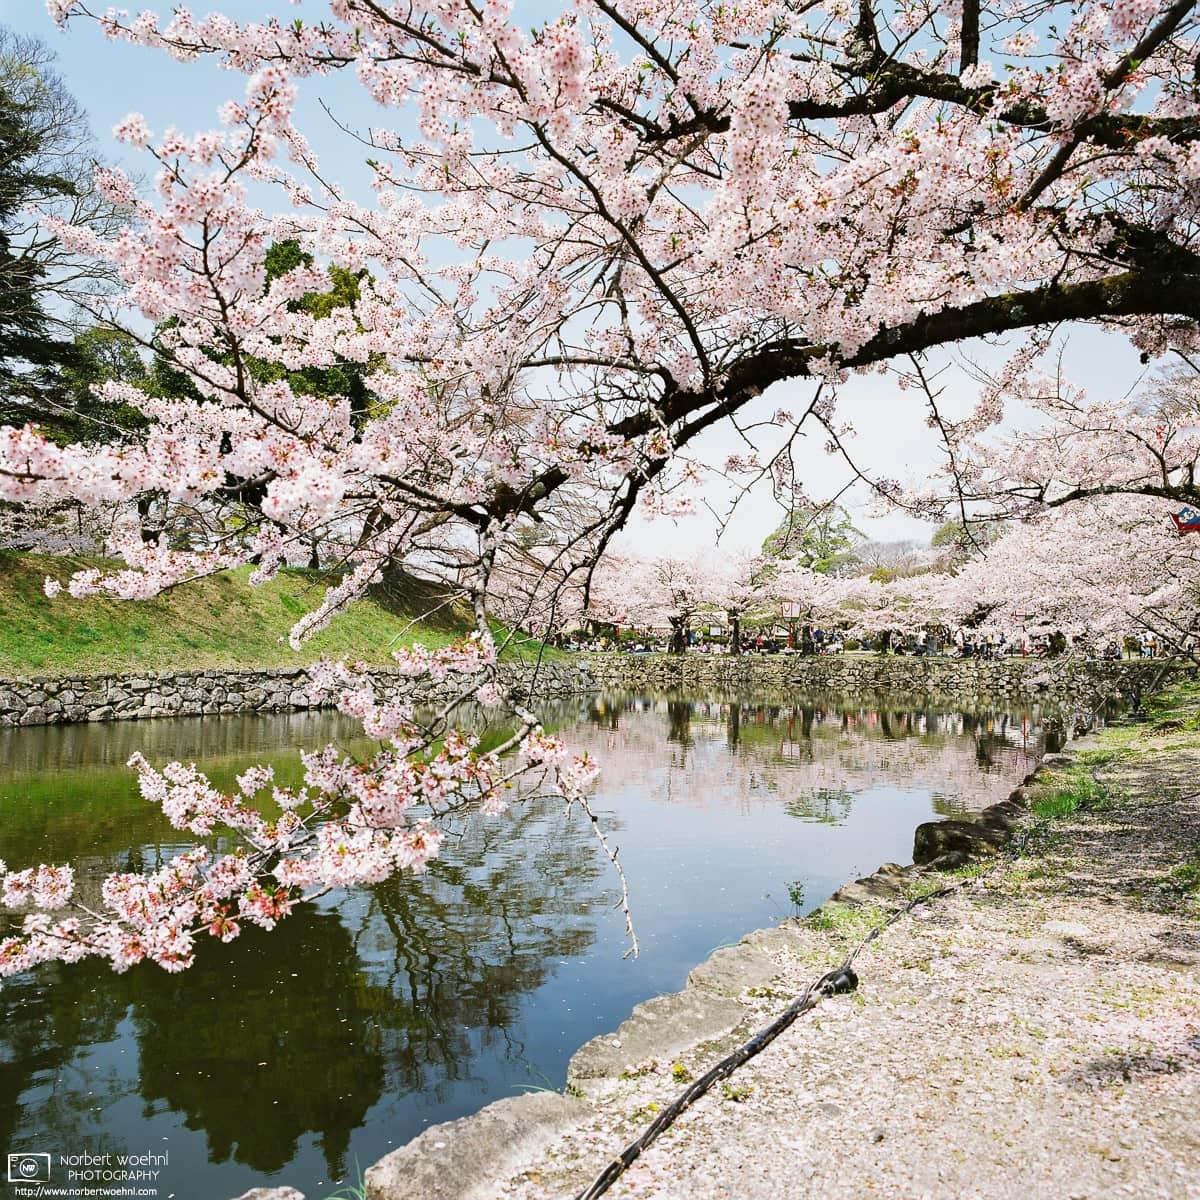 Cherry Blossoms along the Castle Moat, Hikone, Japan Photo